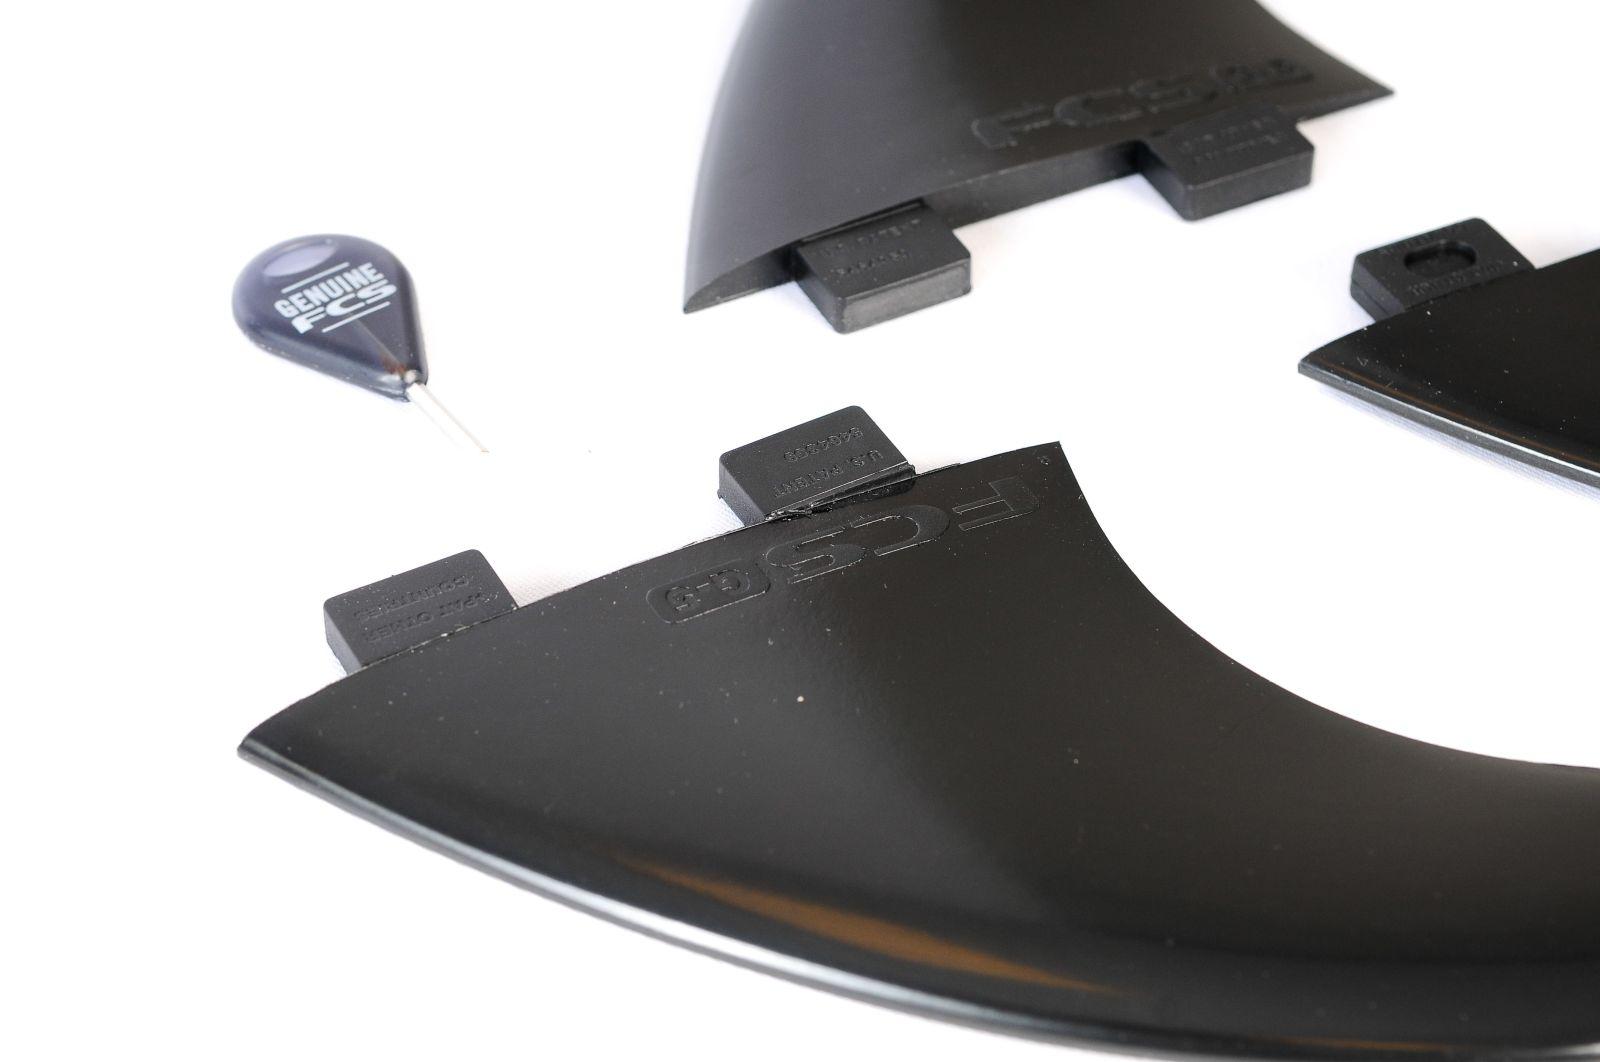 Kitefoil alpinefoil carbon bag boardbag footstrap accessories 2879